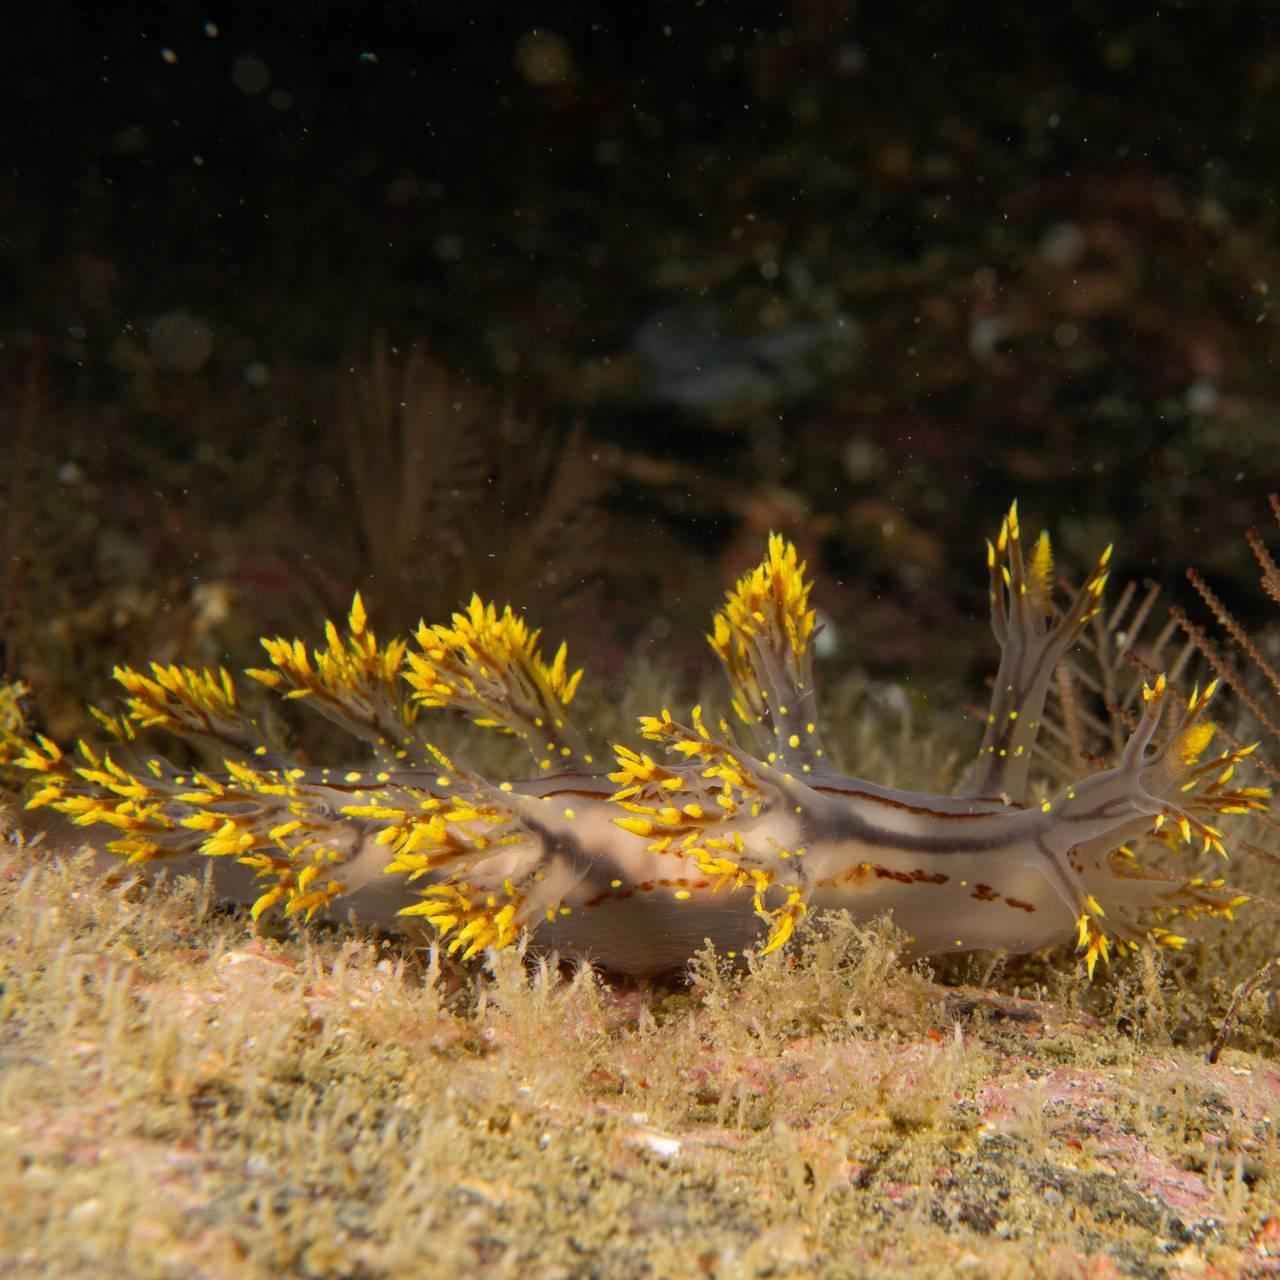 Den nye arten av nakensnegl, Dendronotus yrjargul,